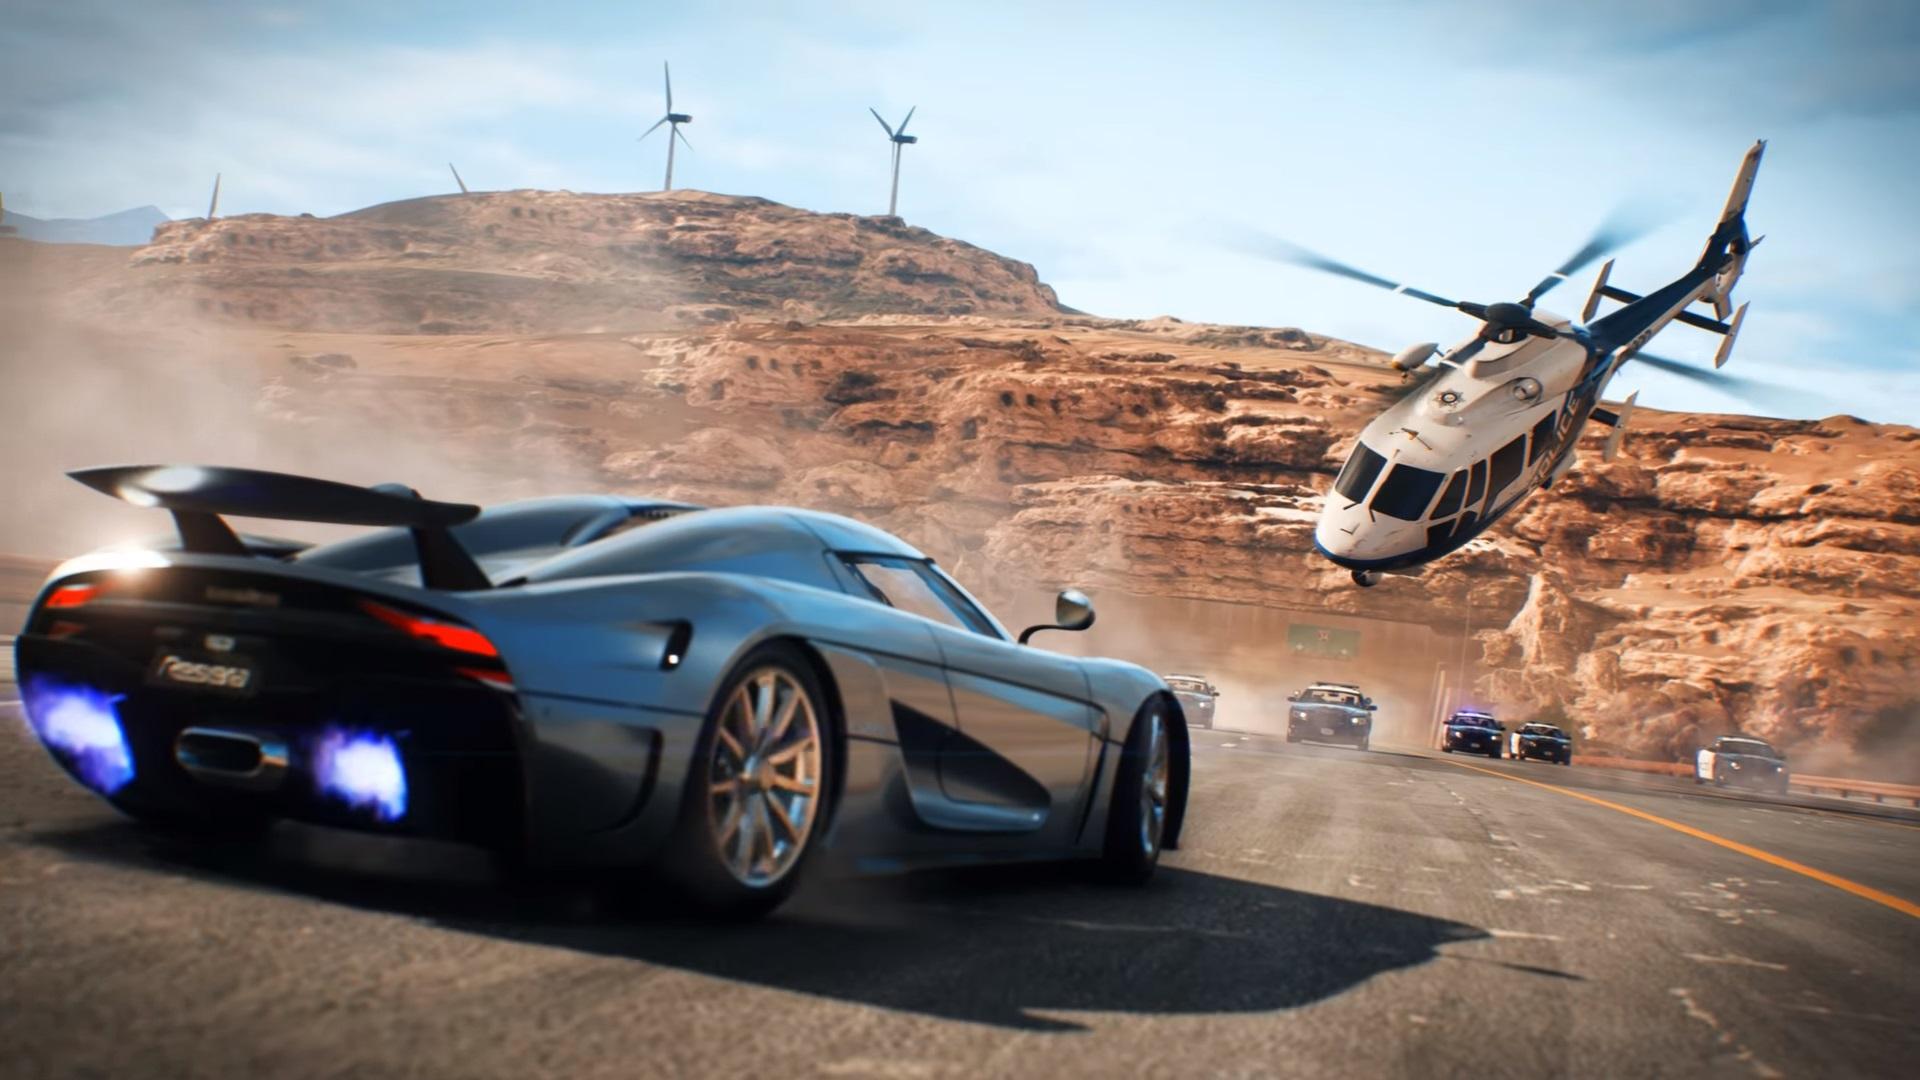 Вышел сюжетный трейлер Need for Speed: Payback